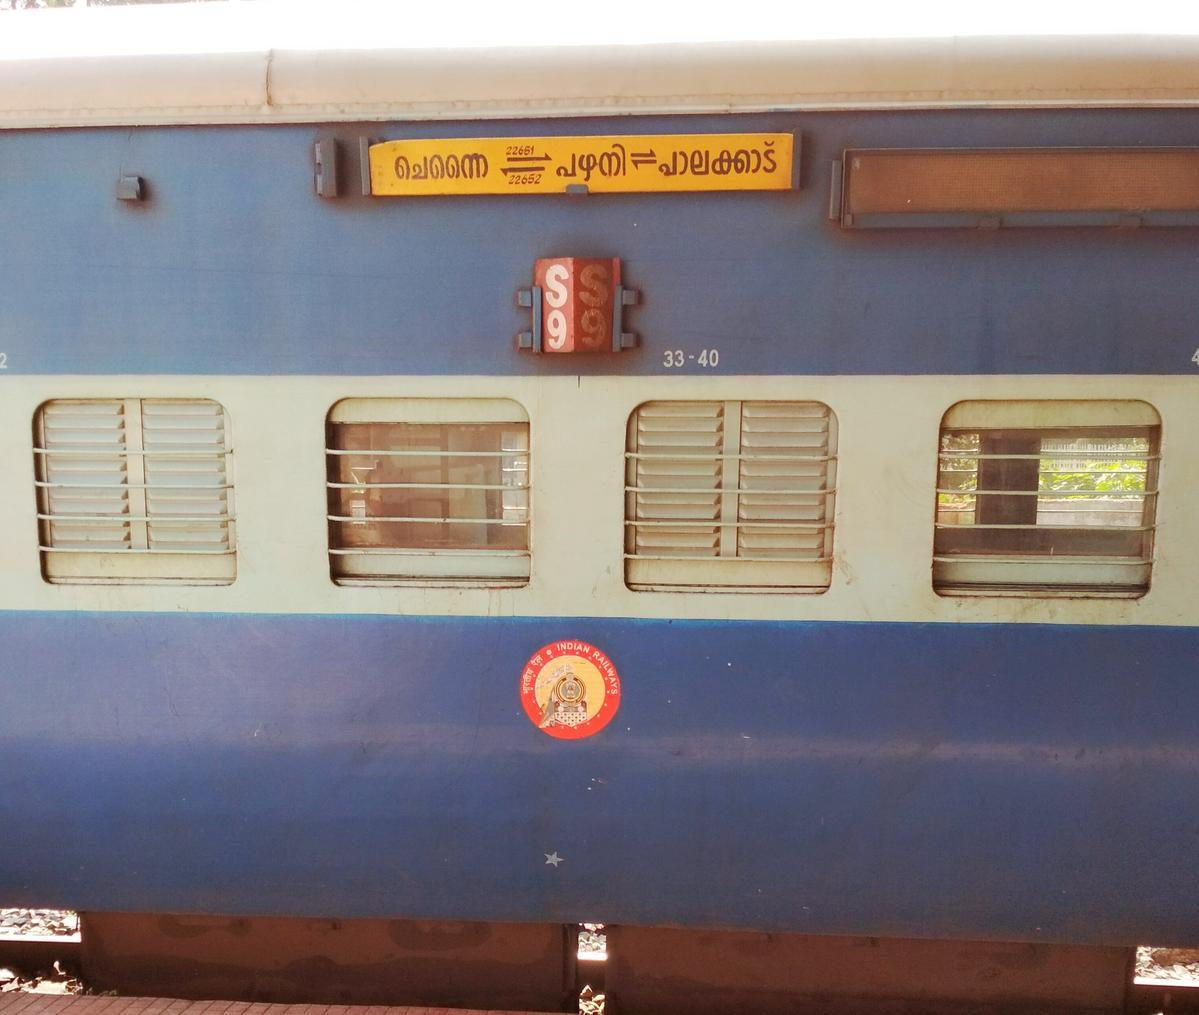 22651/2 Chennai Central - Palakkad Jn. Express with GOC WDG3A #13164.